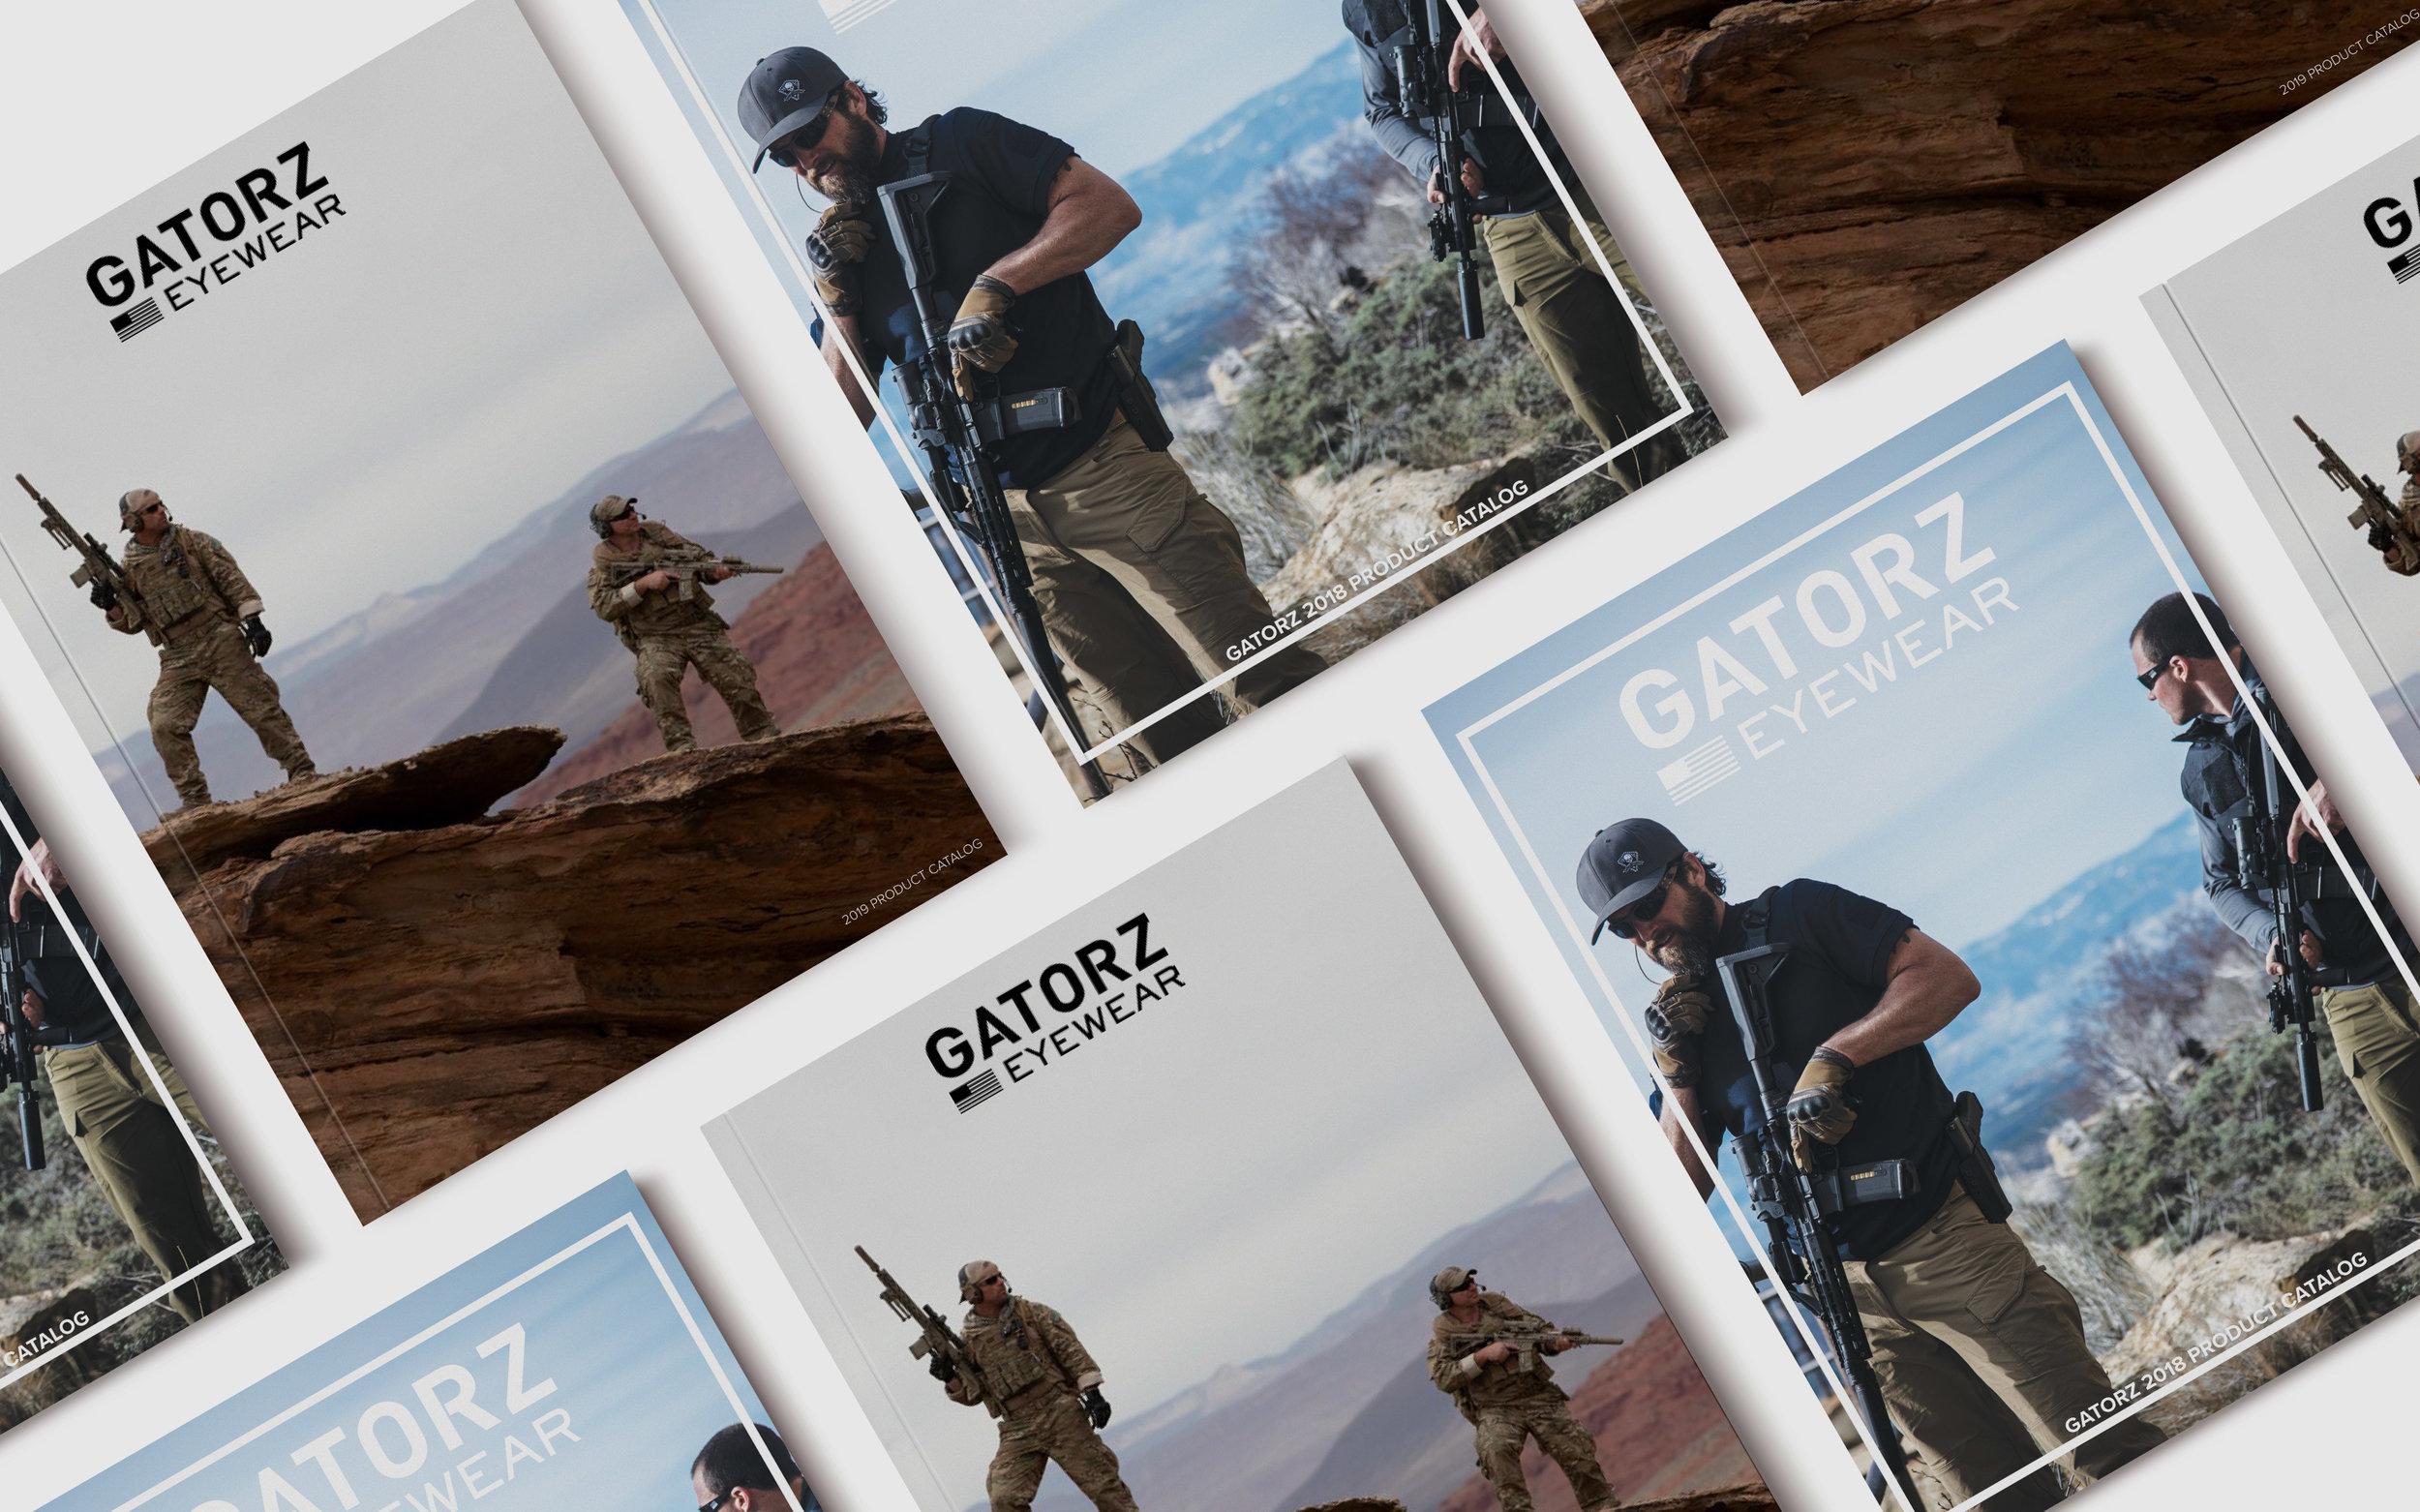 Gatorz_covers.jpg